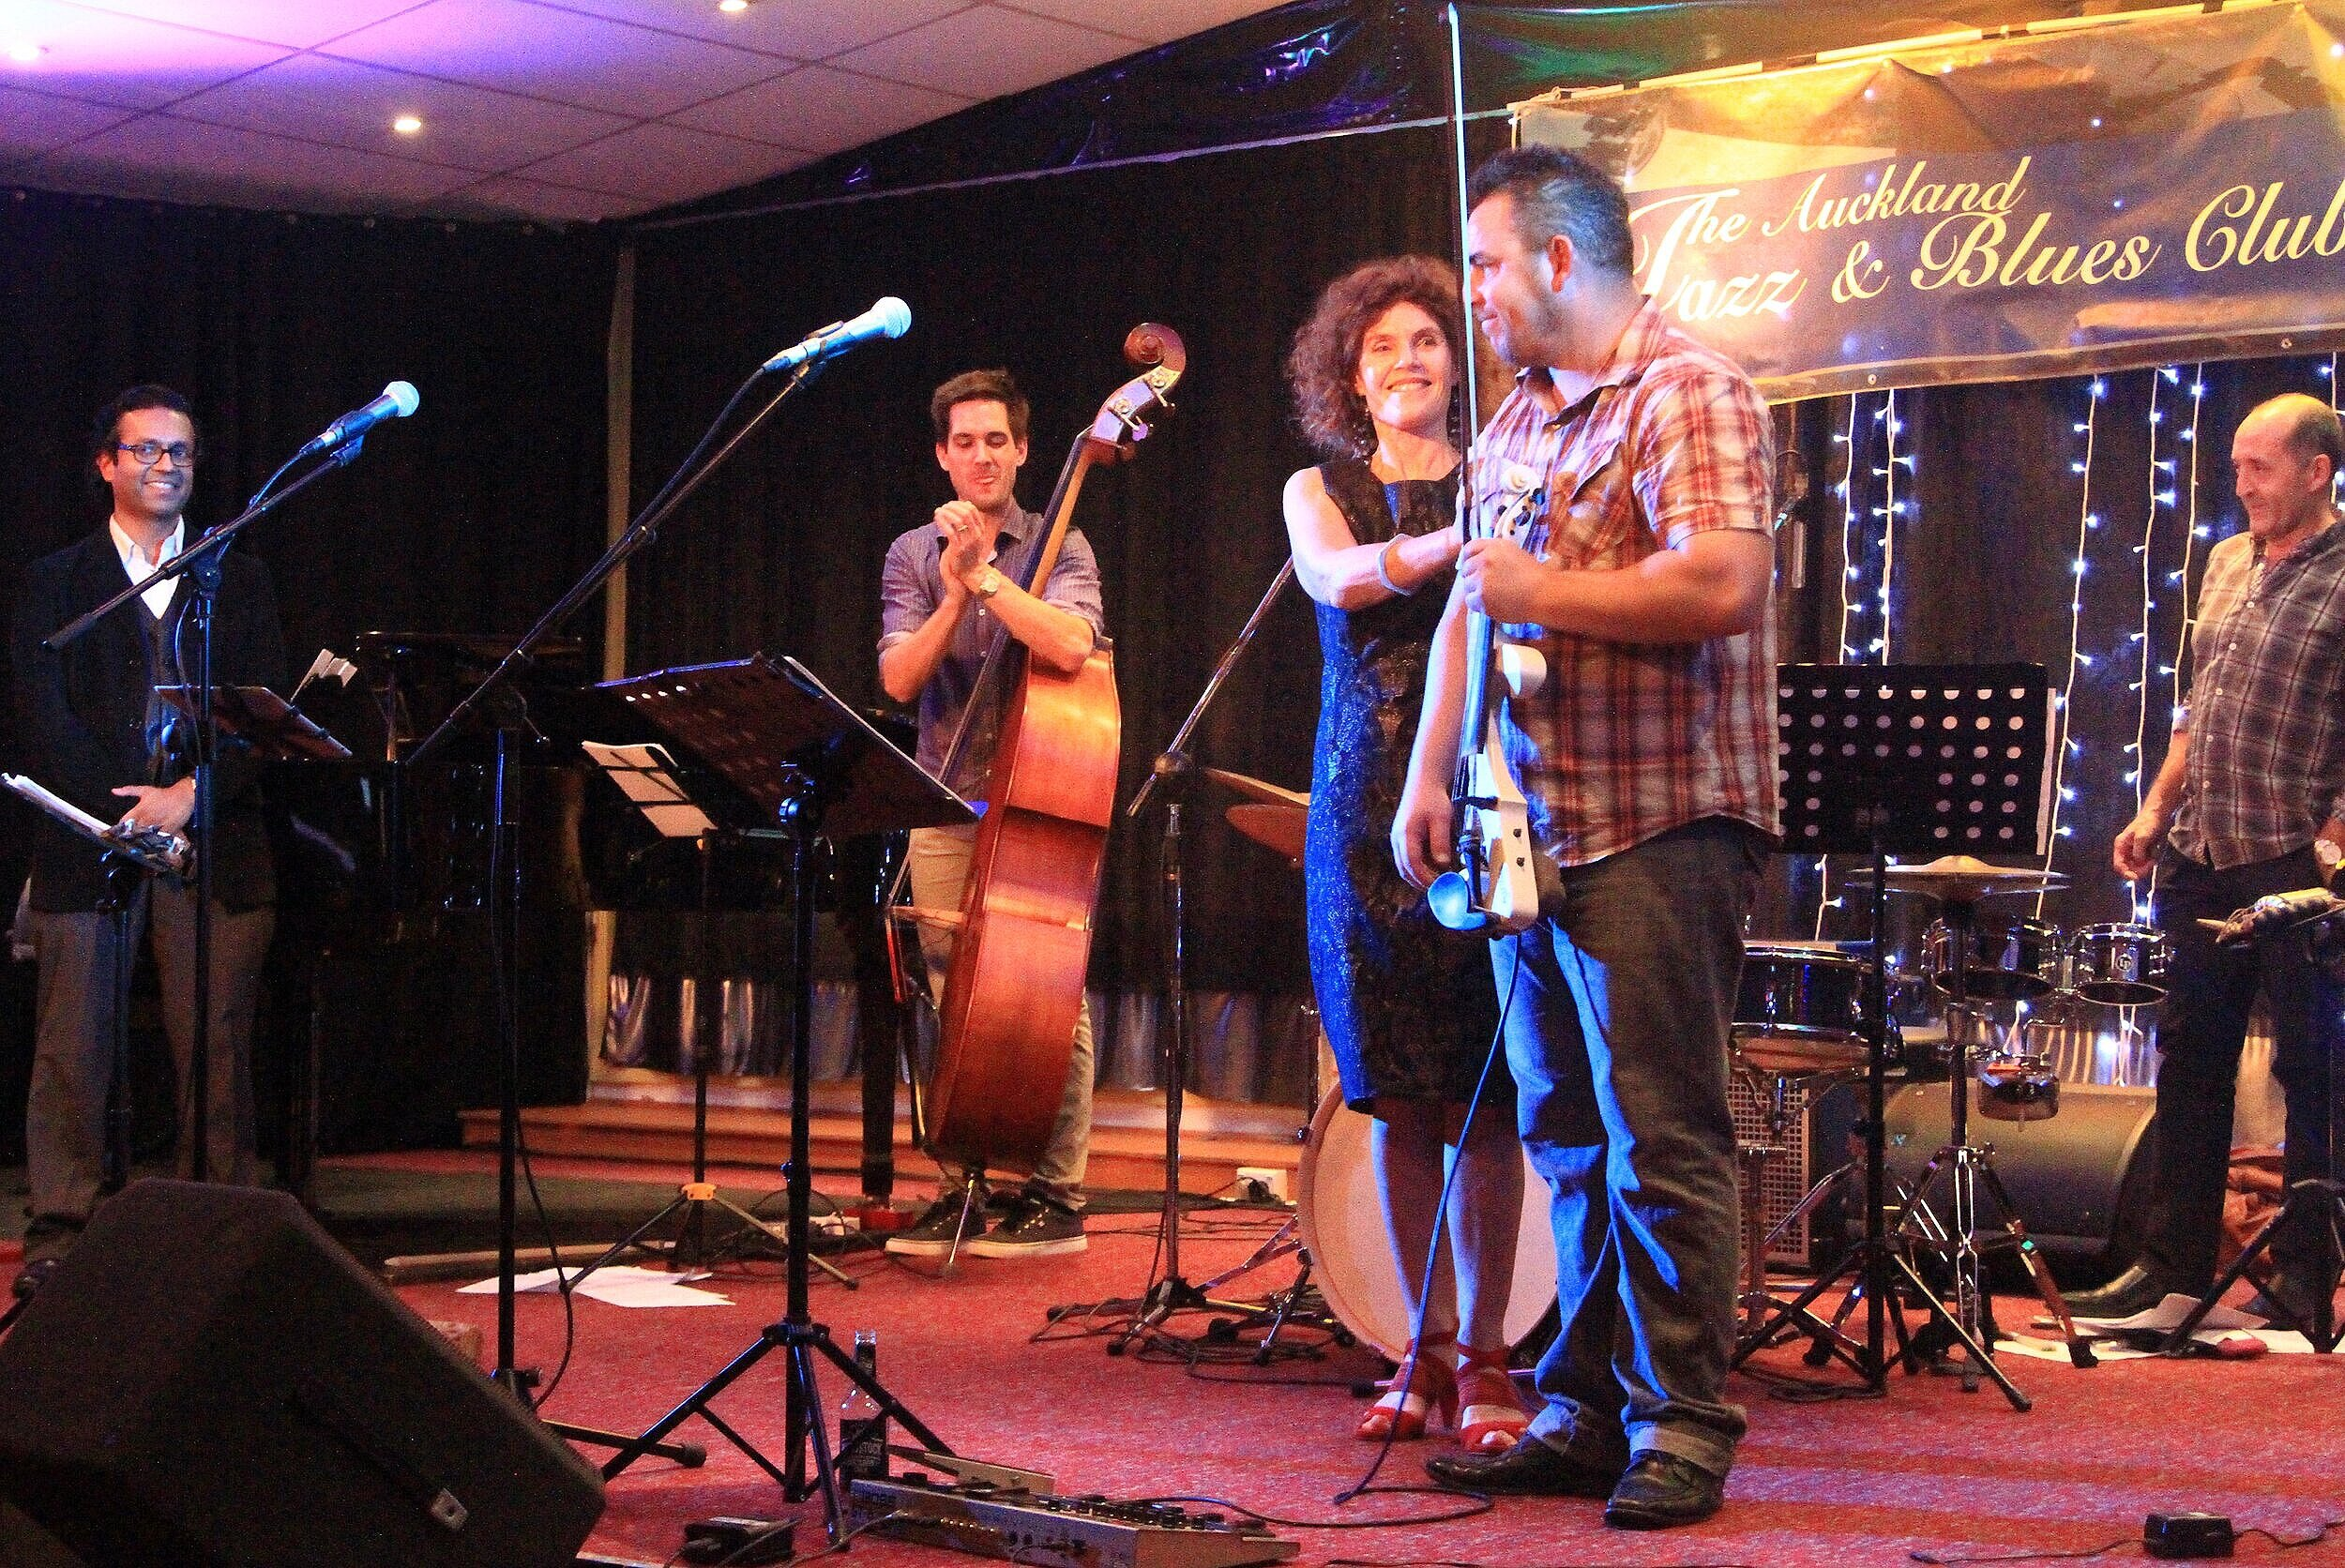 Maria and Ben's band_9-5-17